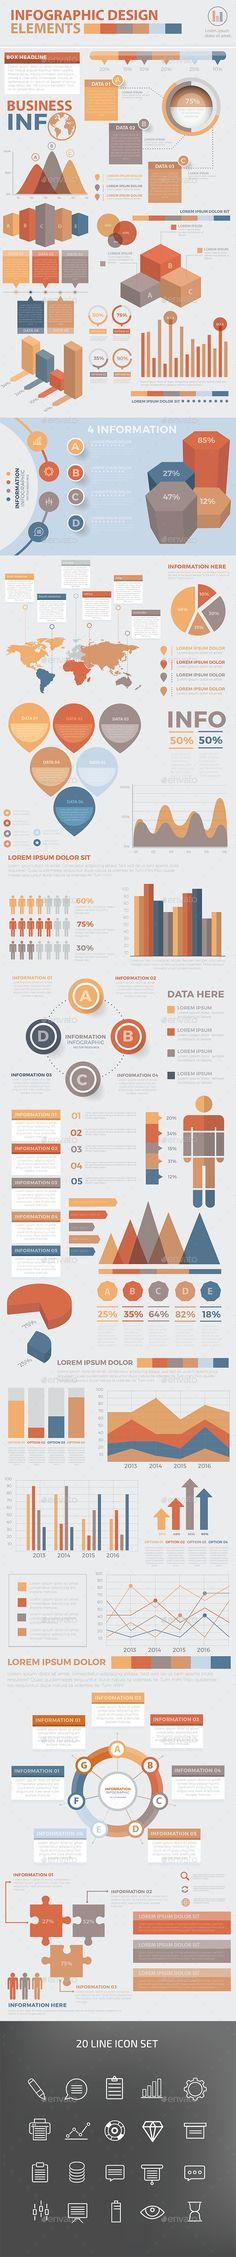 Modern Infographic Elements Design Template Vector EPS, AI Illustrator. Download here: http://graphicriver.net/item/modern-infographic-elements-design/16181034?ref=ksioks